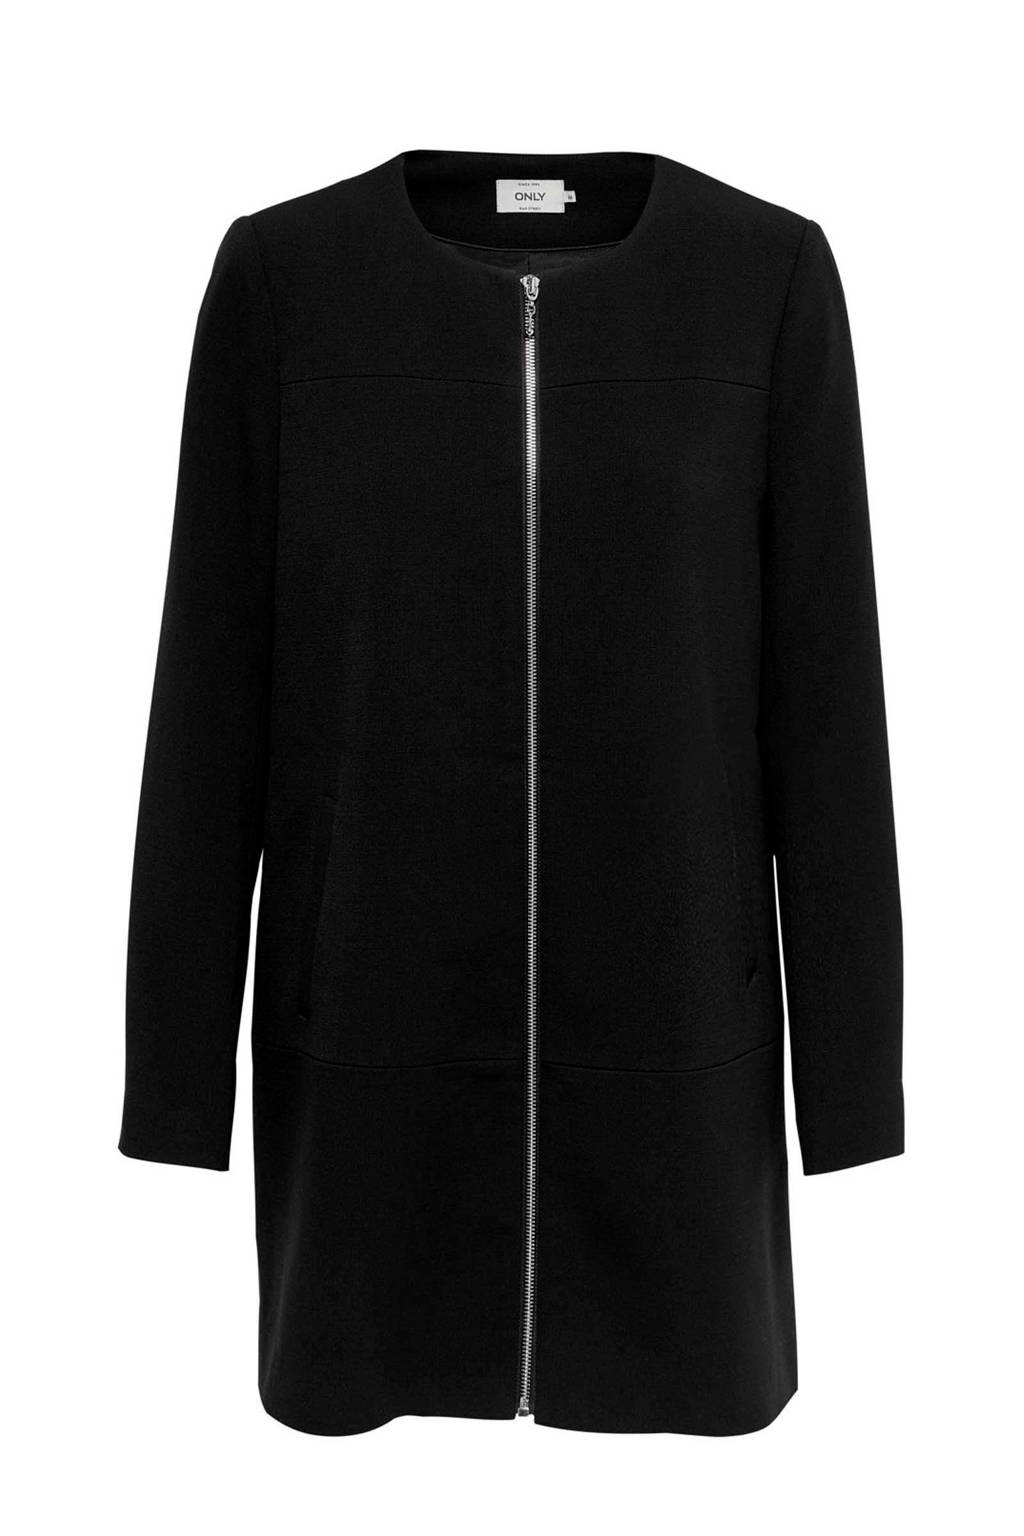 ONLY coat zwart, Zwart